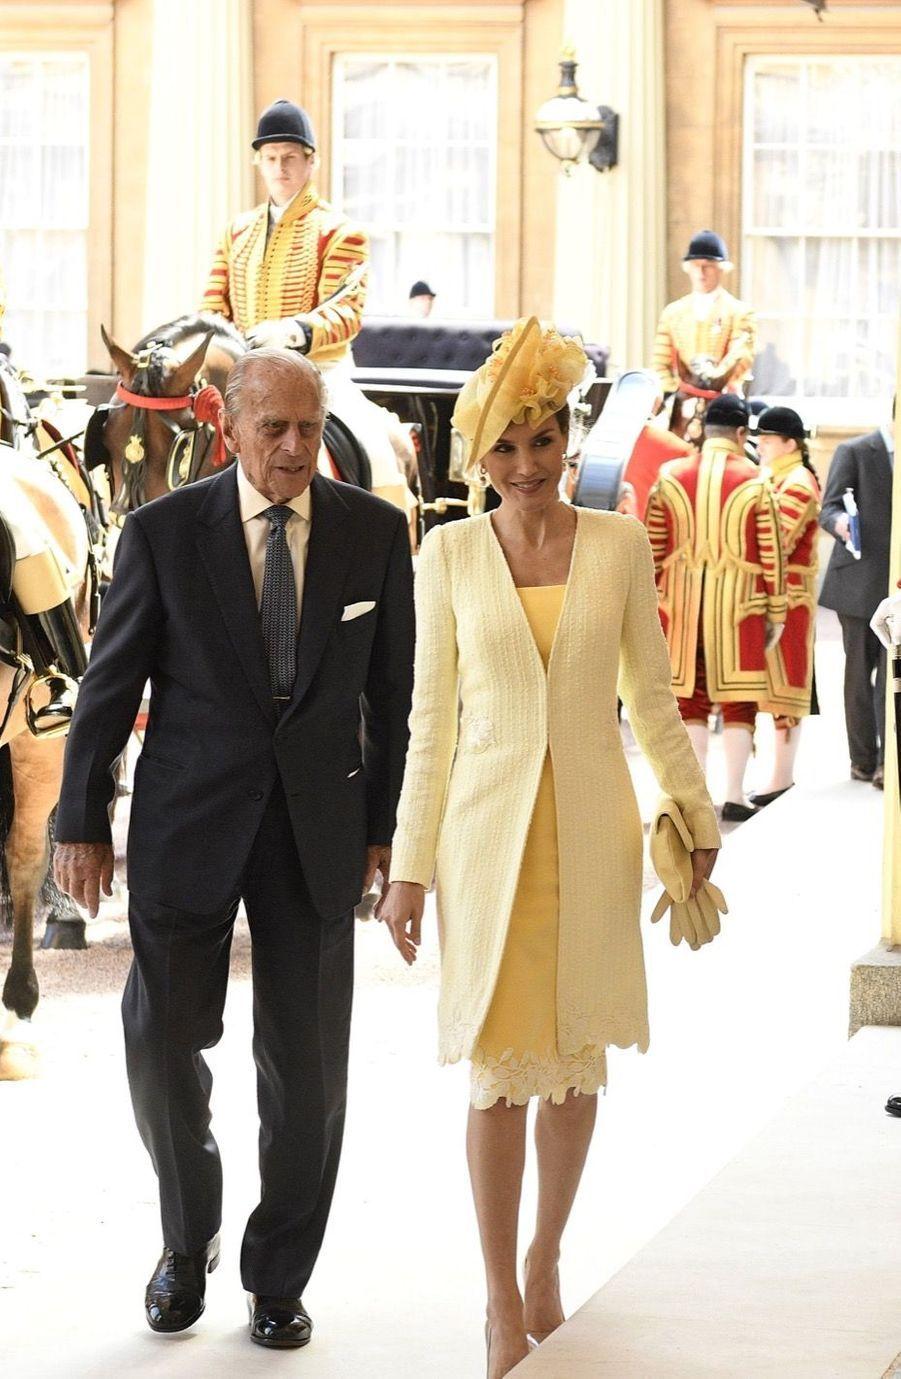 Letizia Et Felipe En Visite Chez La Reine Elizabeth II 27